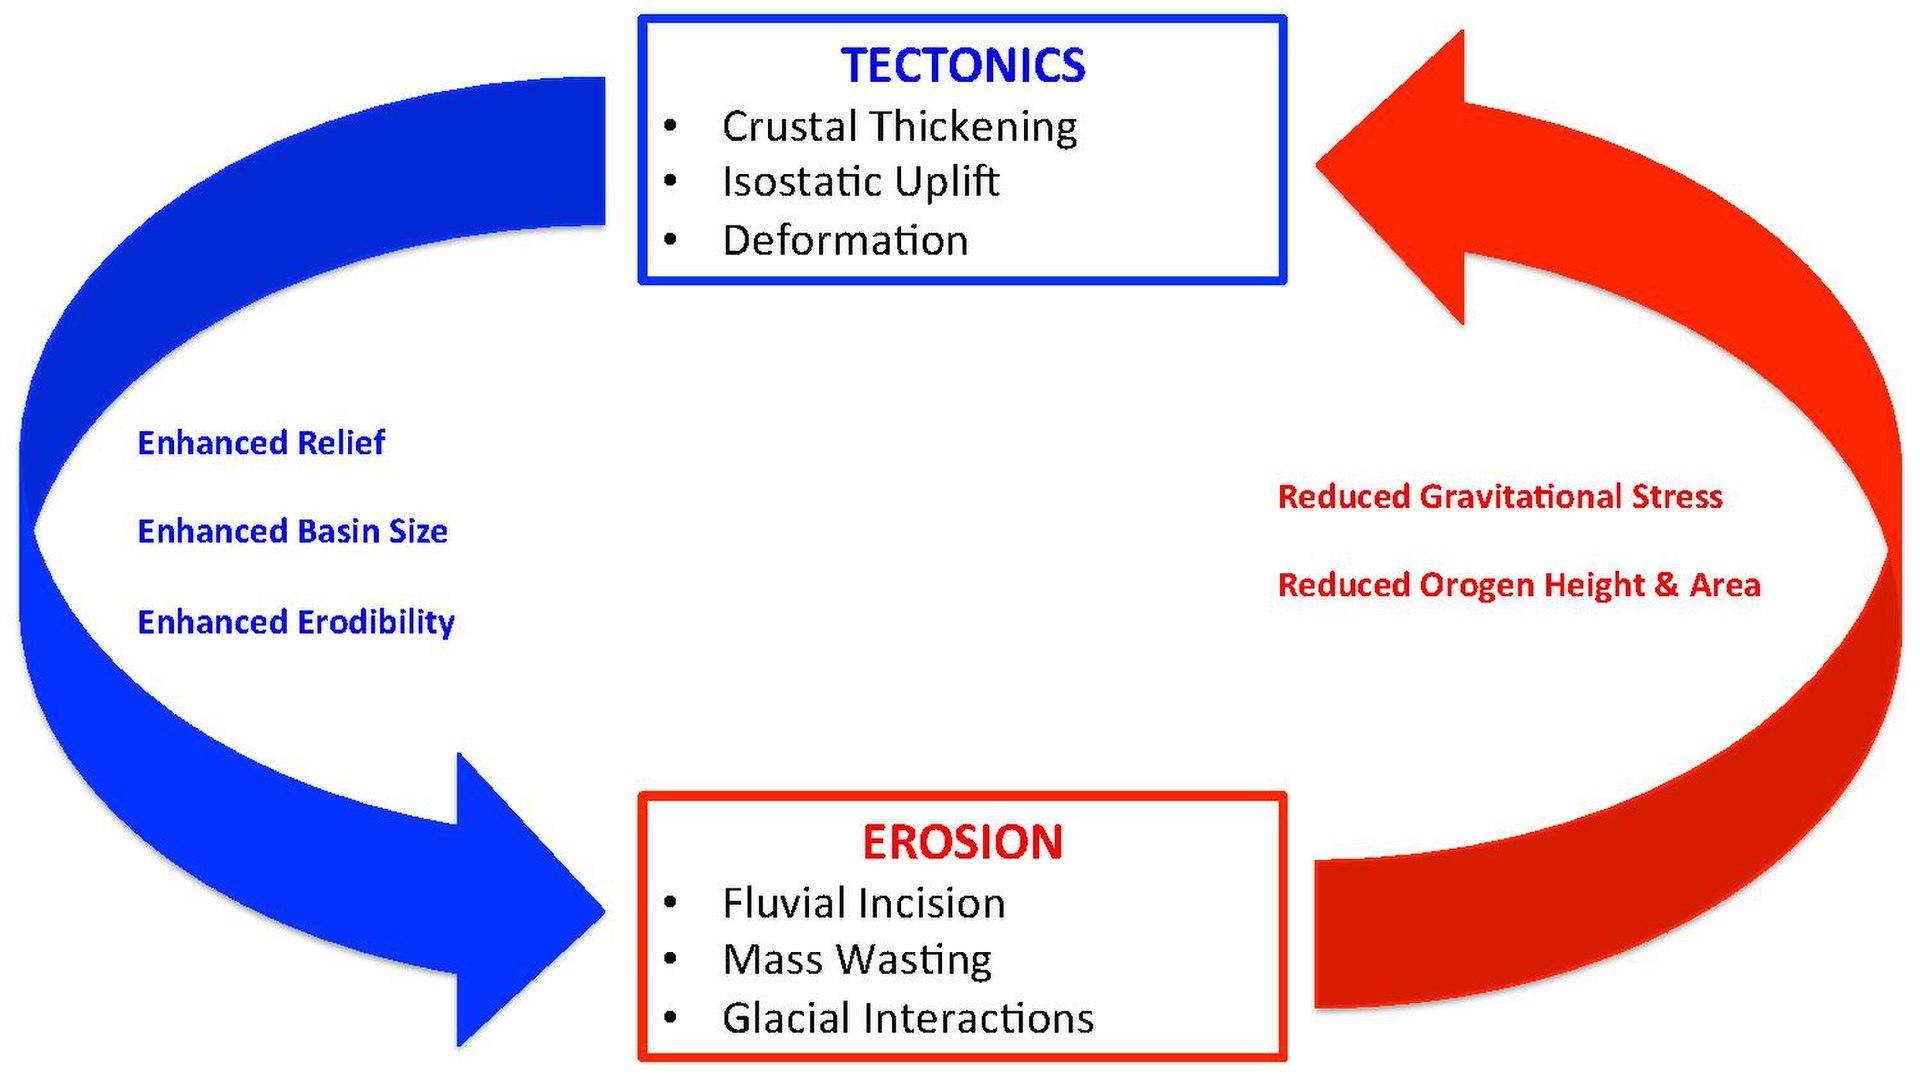 Erosion And Tectonics